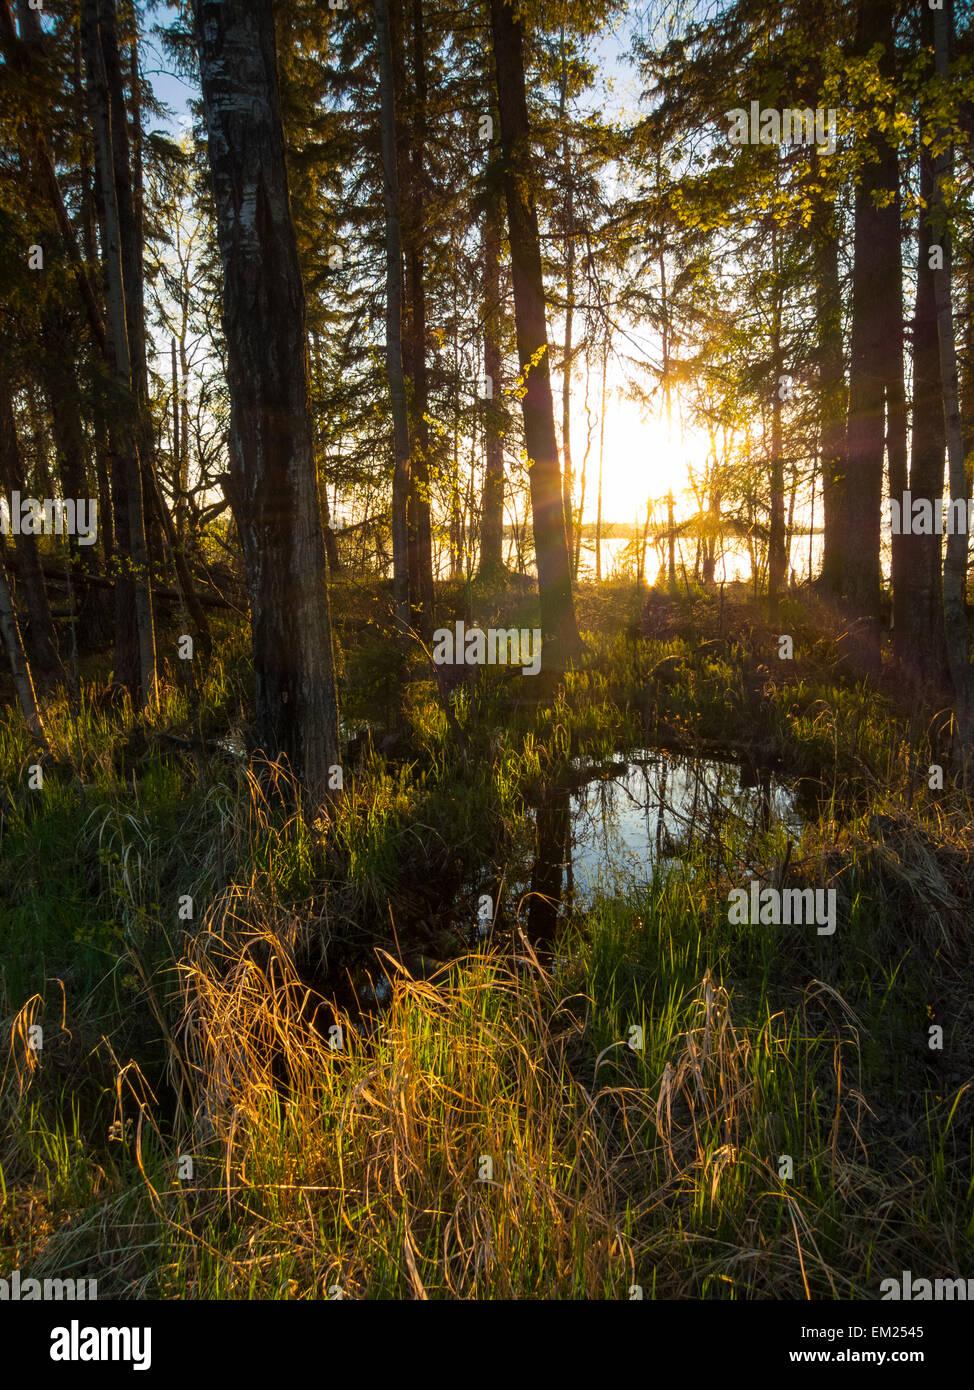 Snow melt pools in arboreal forest lines Dore Lake North of Saskatoon, Saskatchewan, Canada. - Stock Image